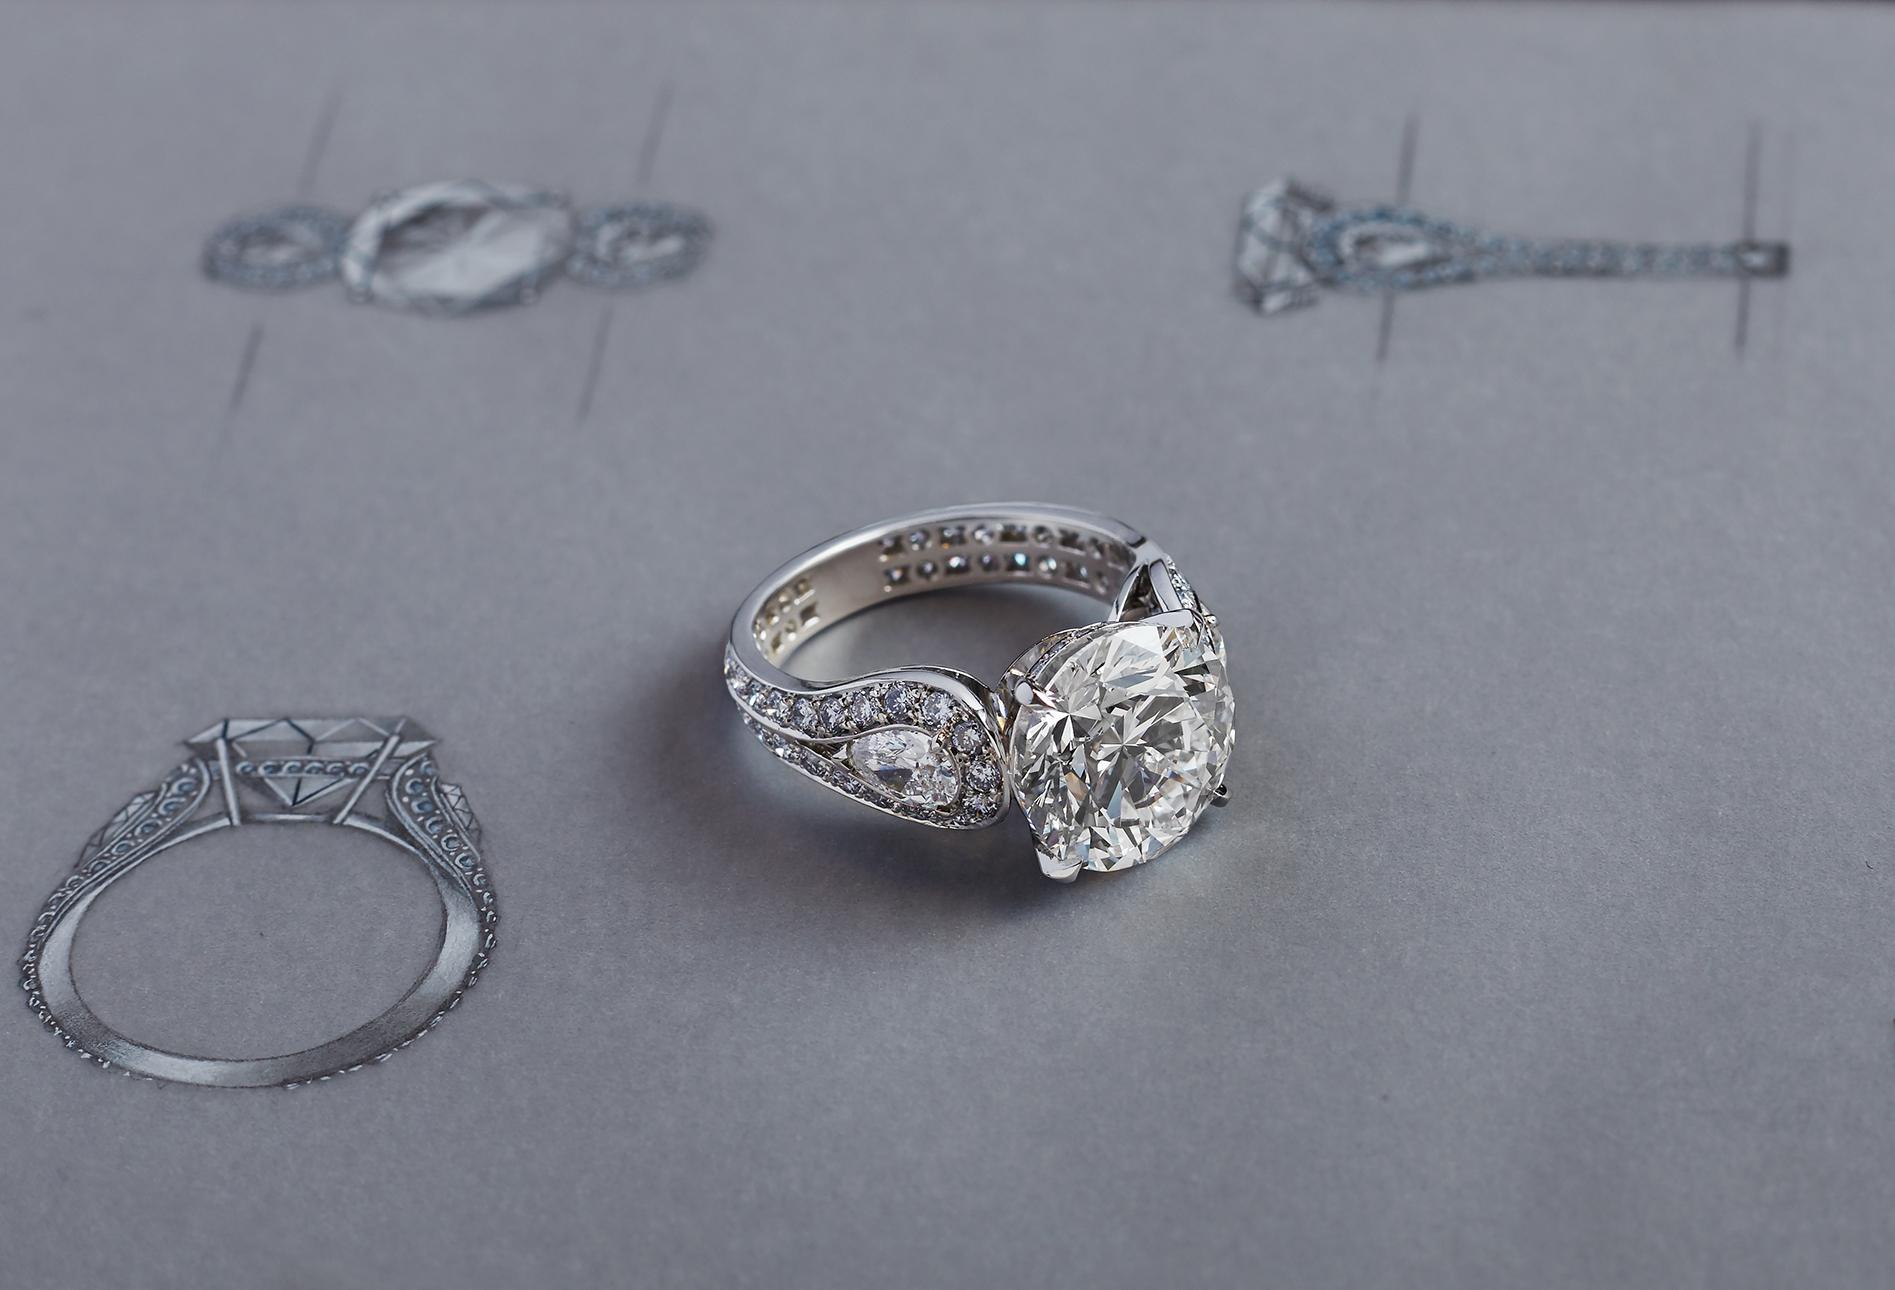 Diamond ring on drawing banner.jpg